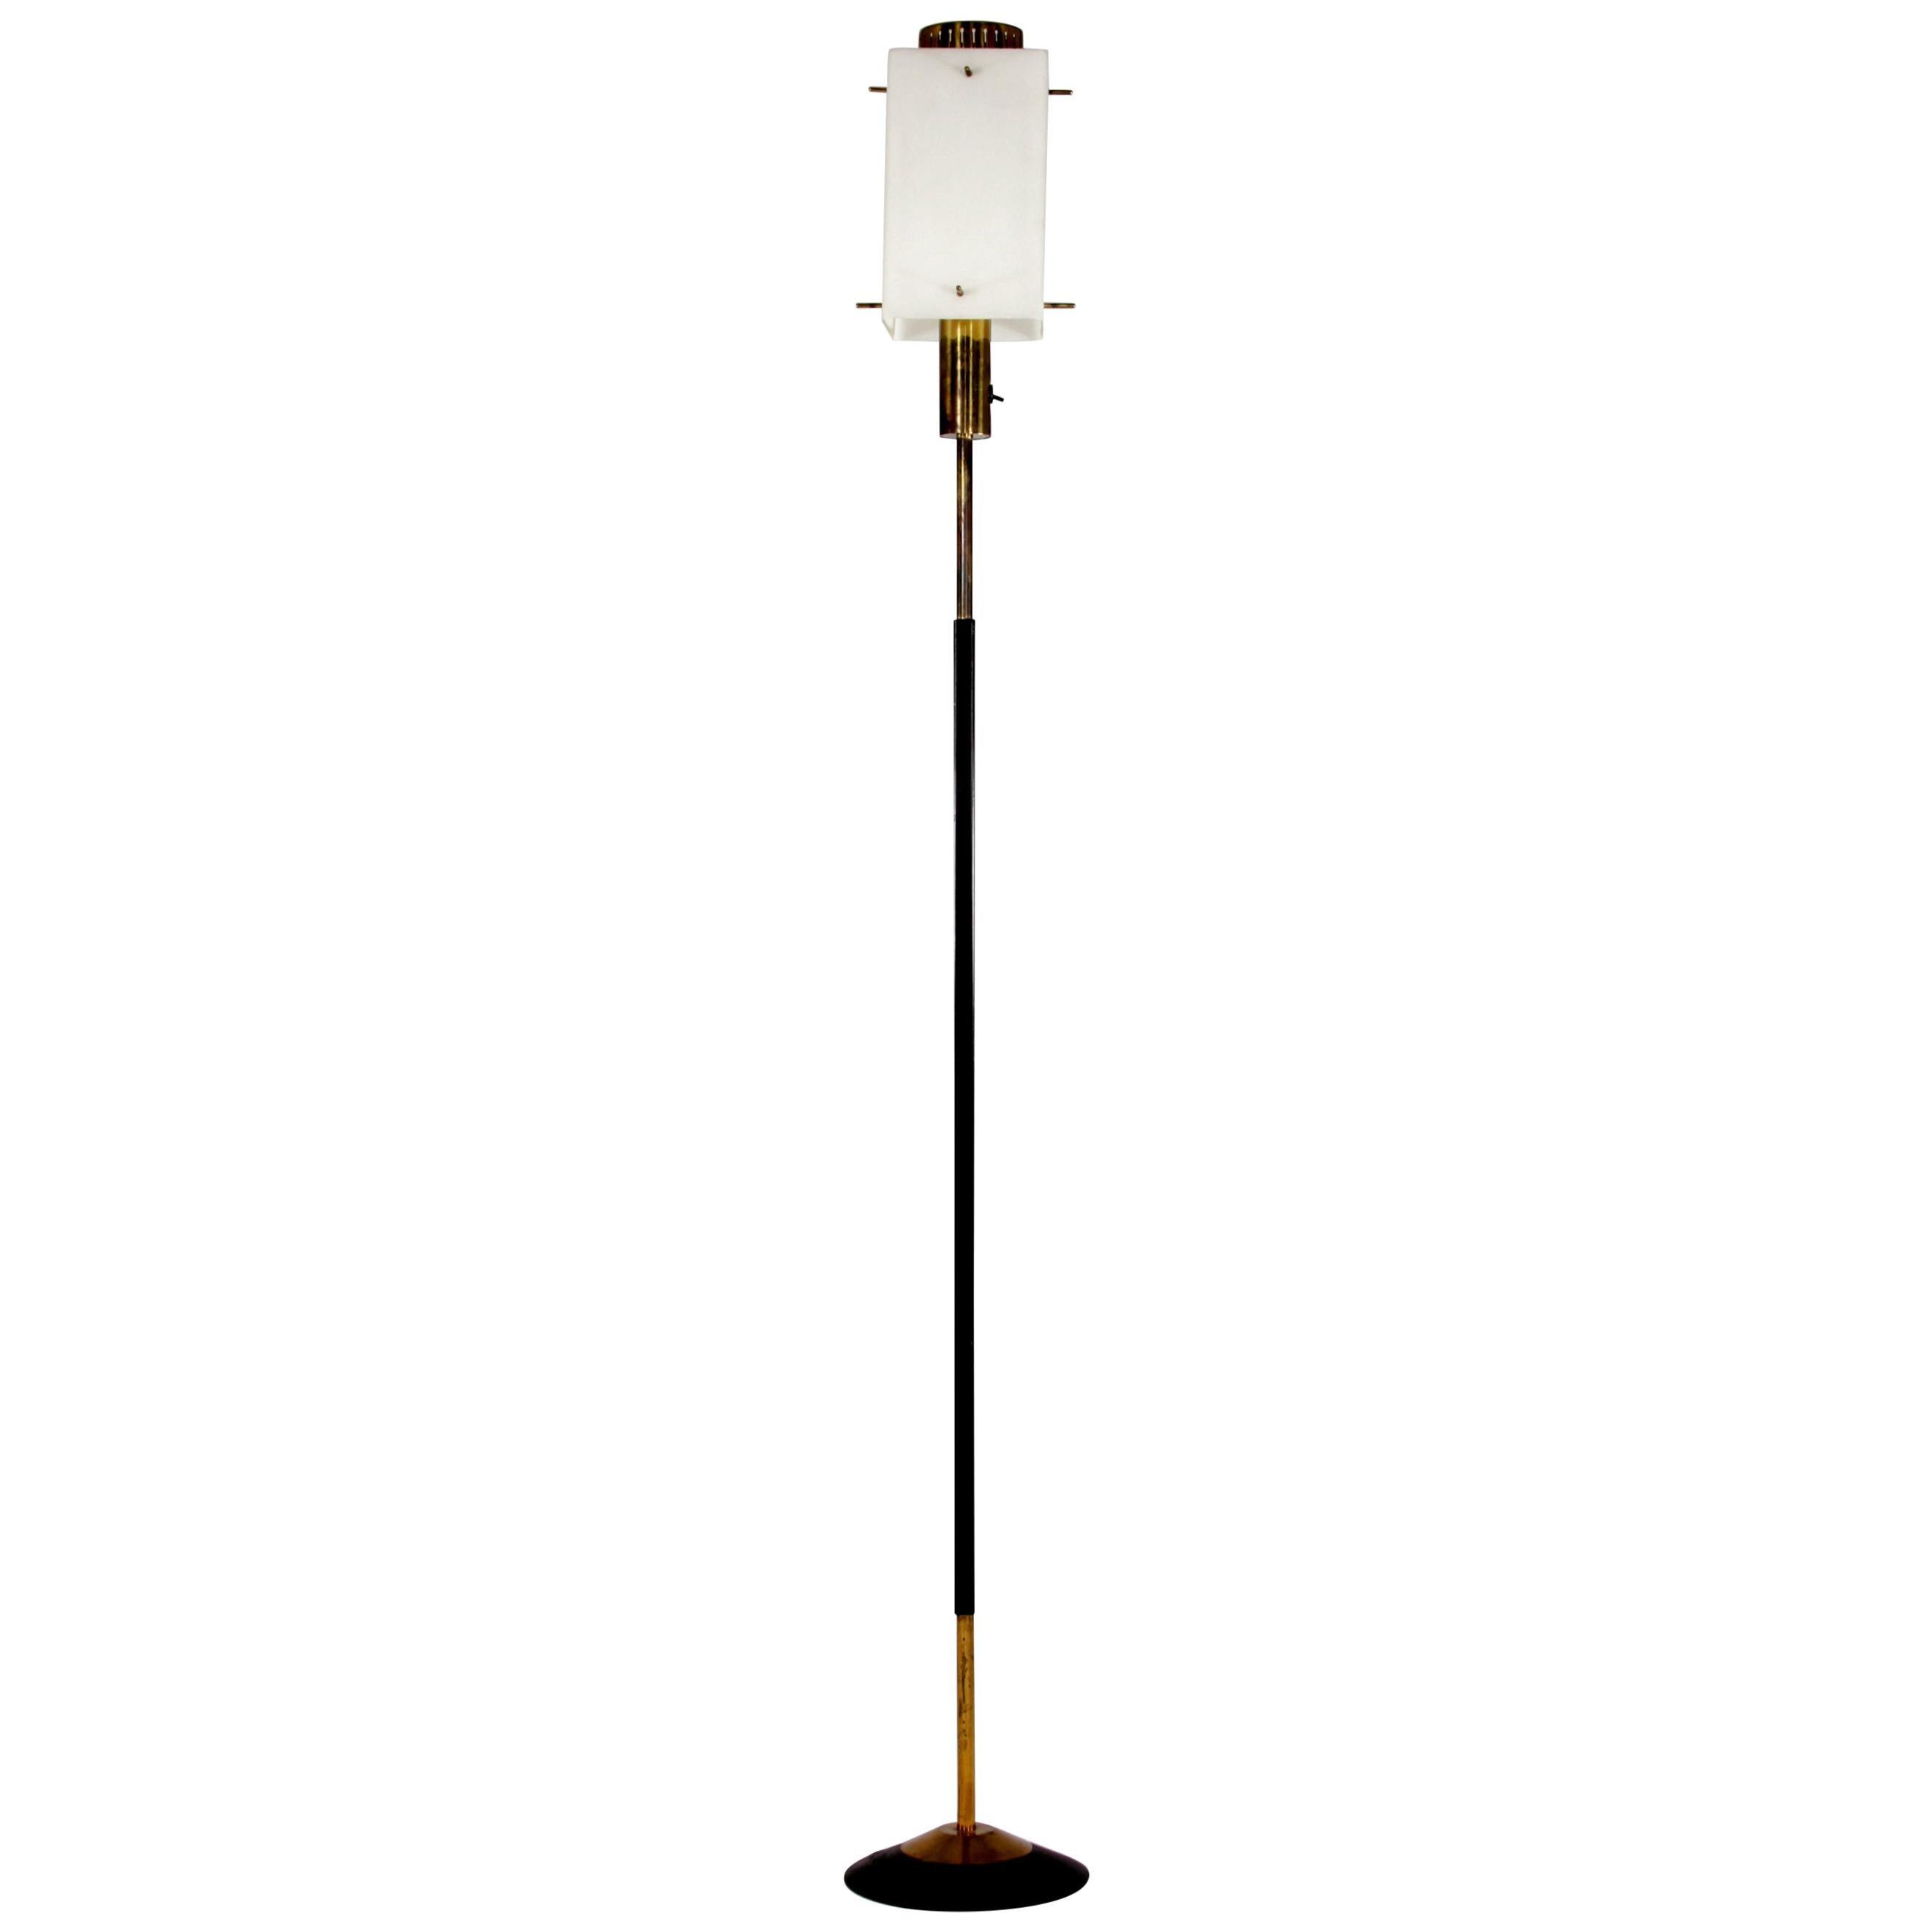 Mid-Century Modern Stilnovo Brass Floor Lamp, Italy, 1950s